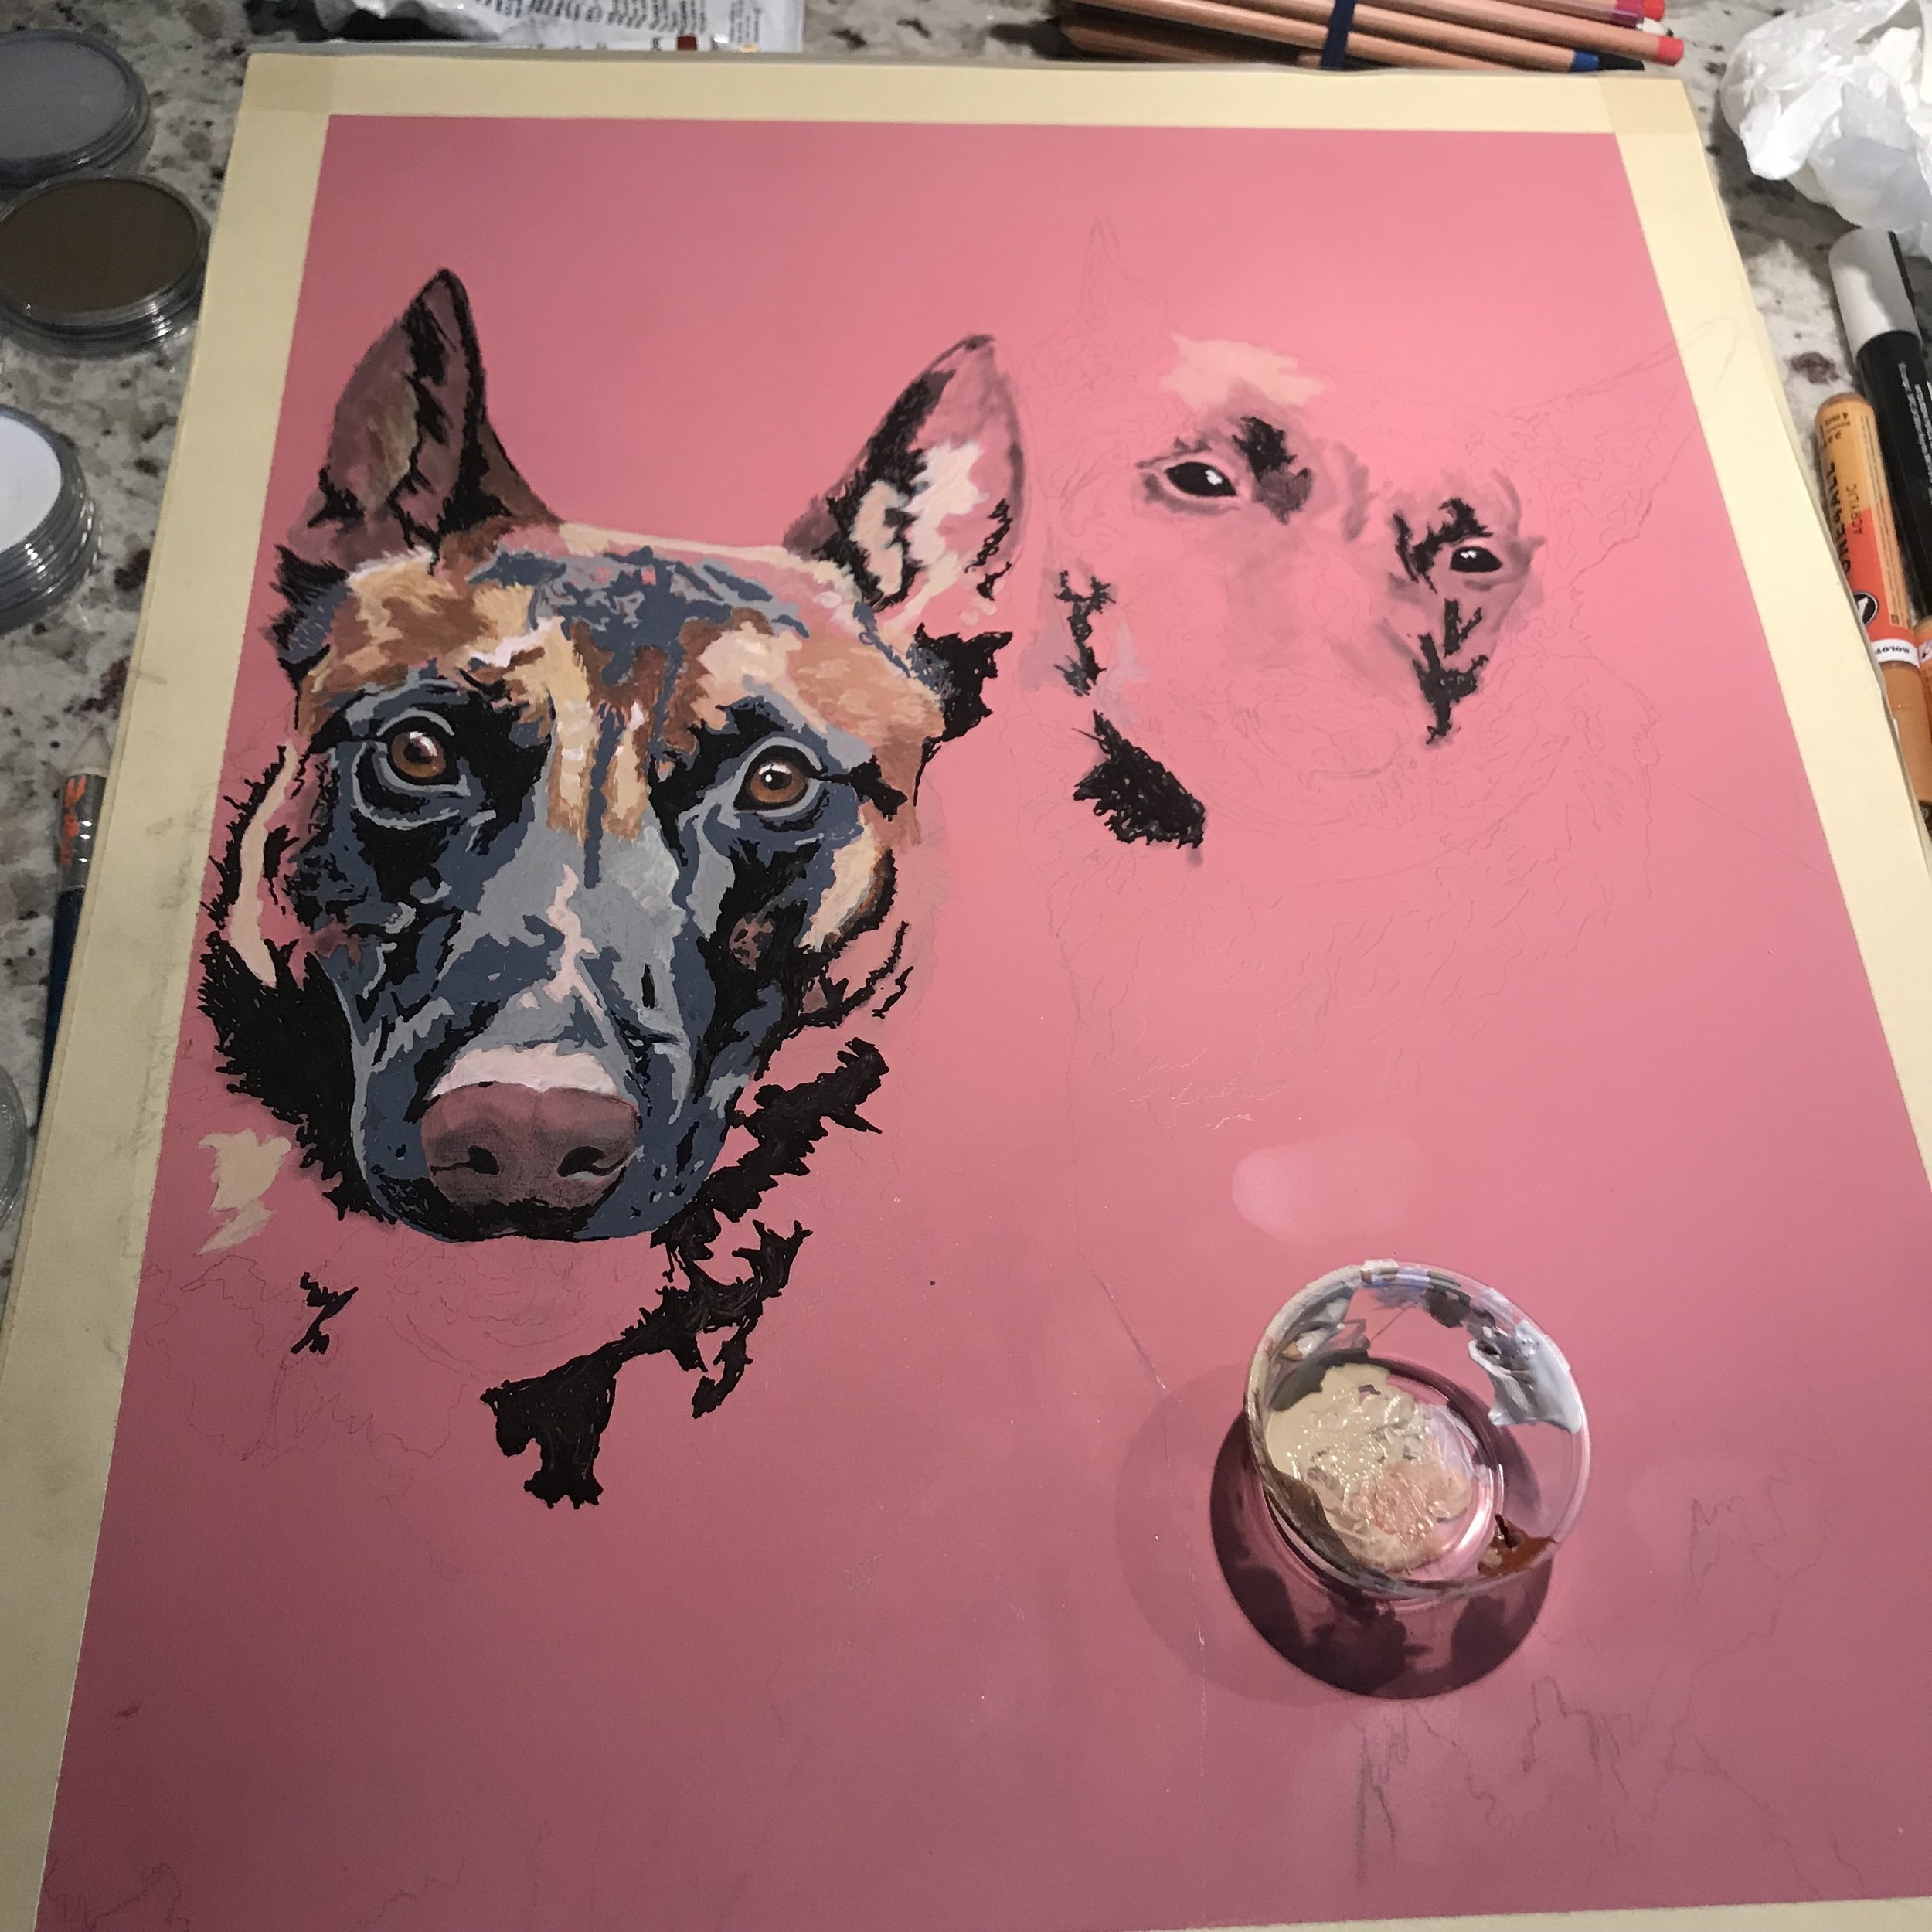 Belgian Malinois Painting In Progress By Casey Lynn Hancock